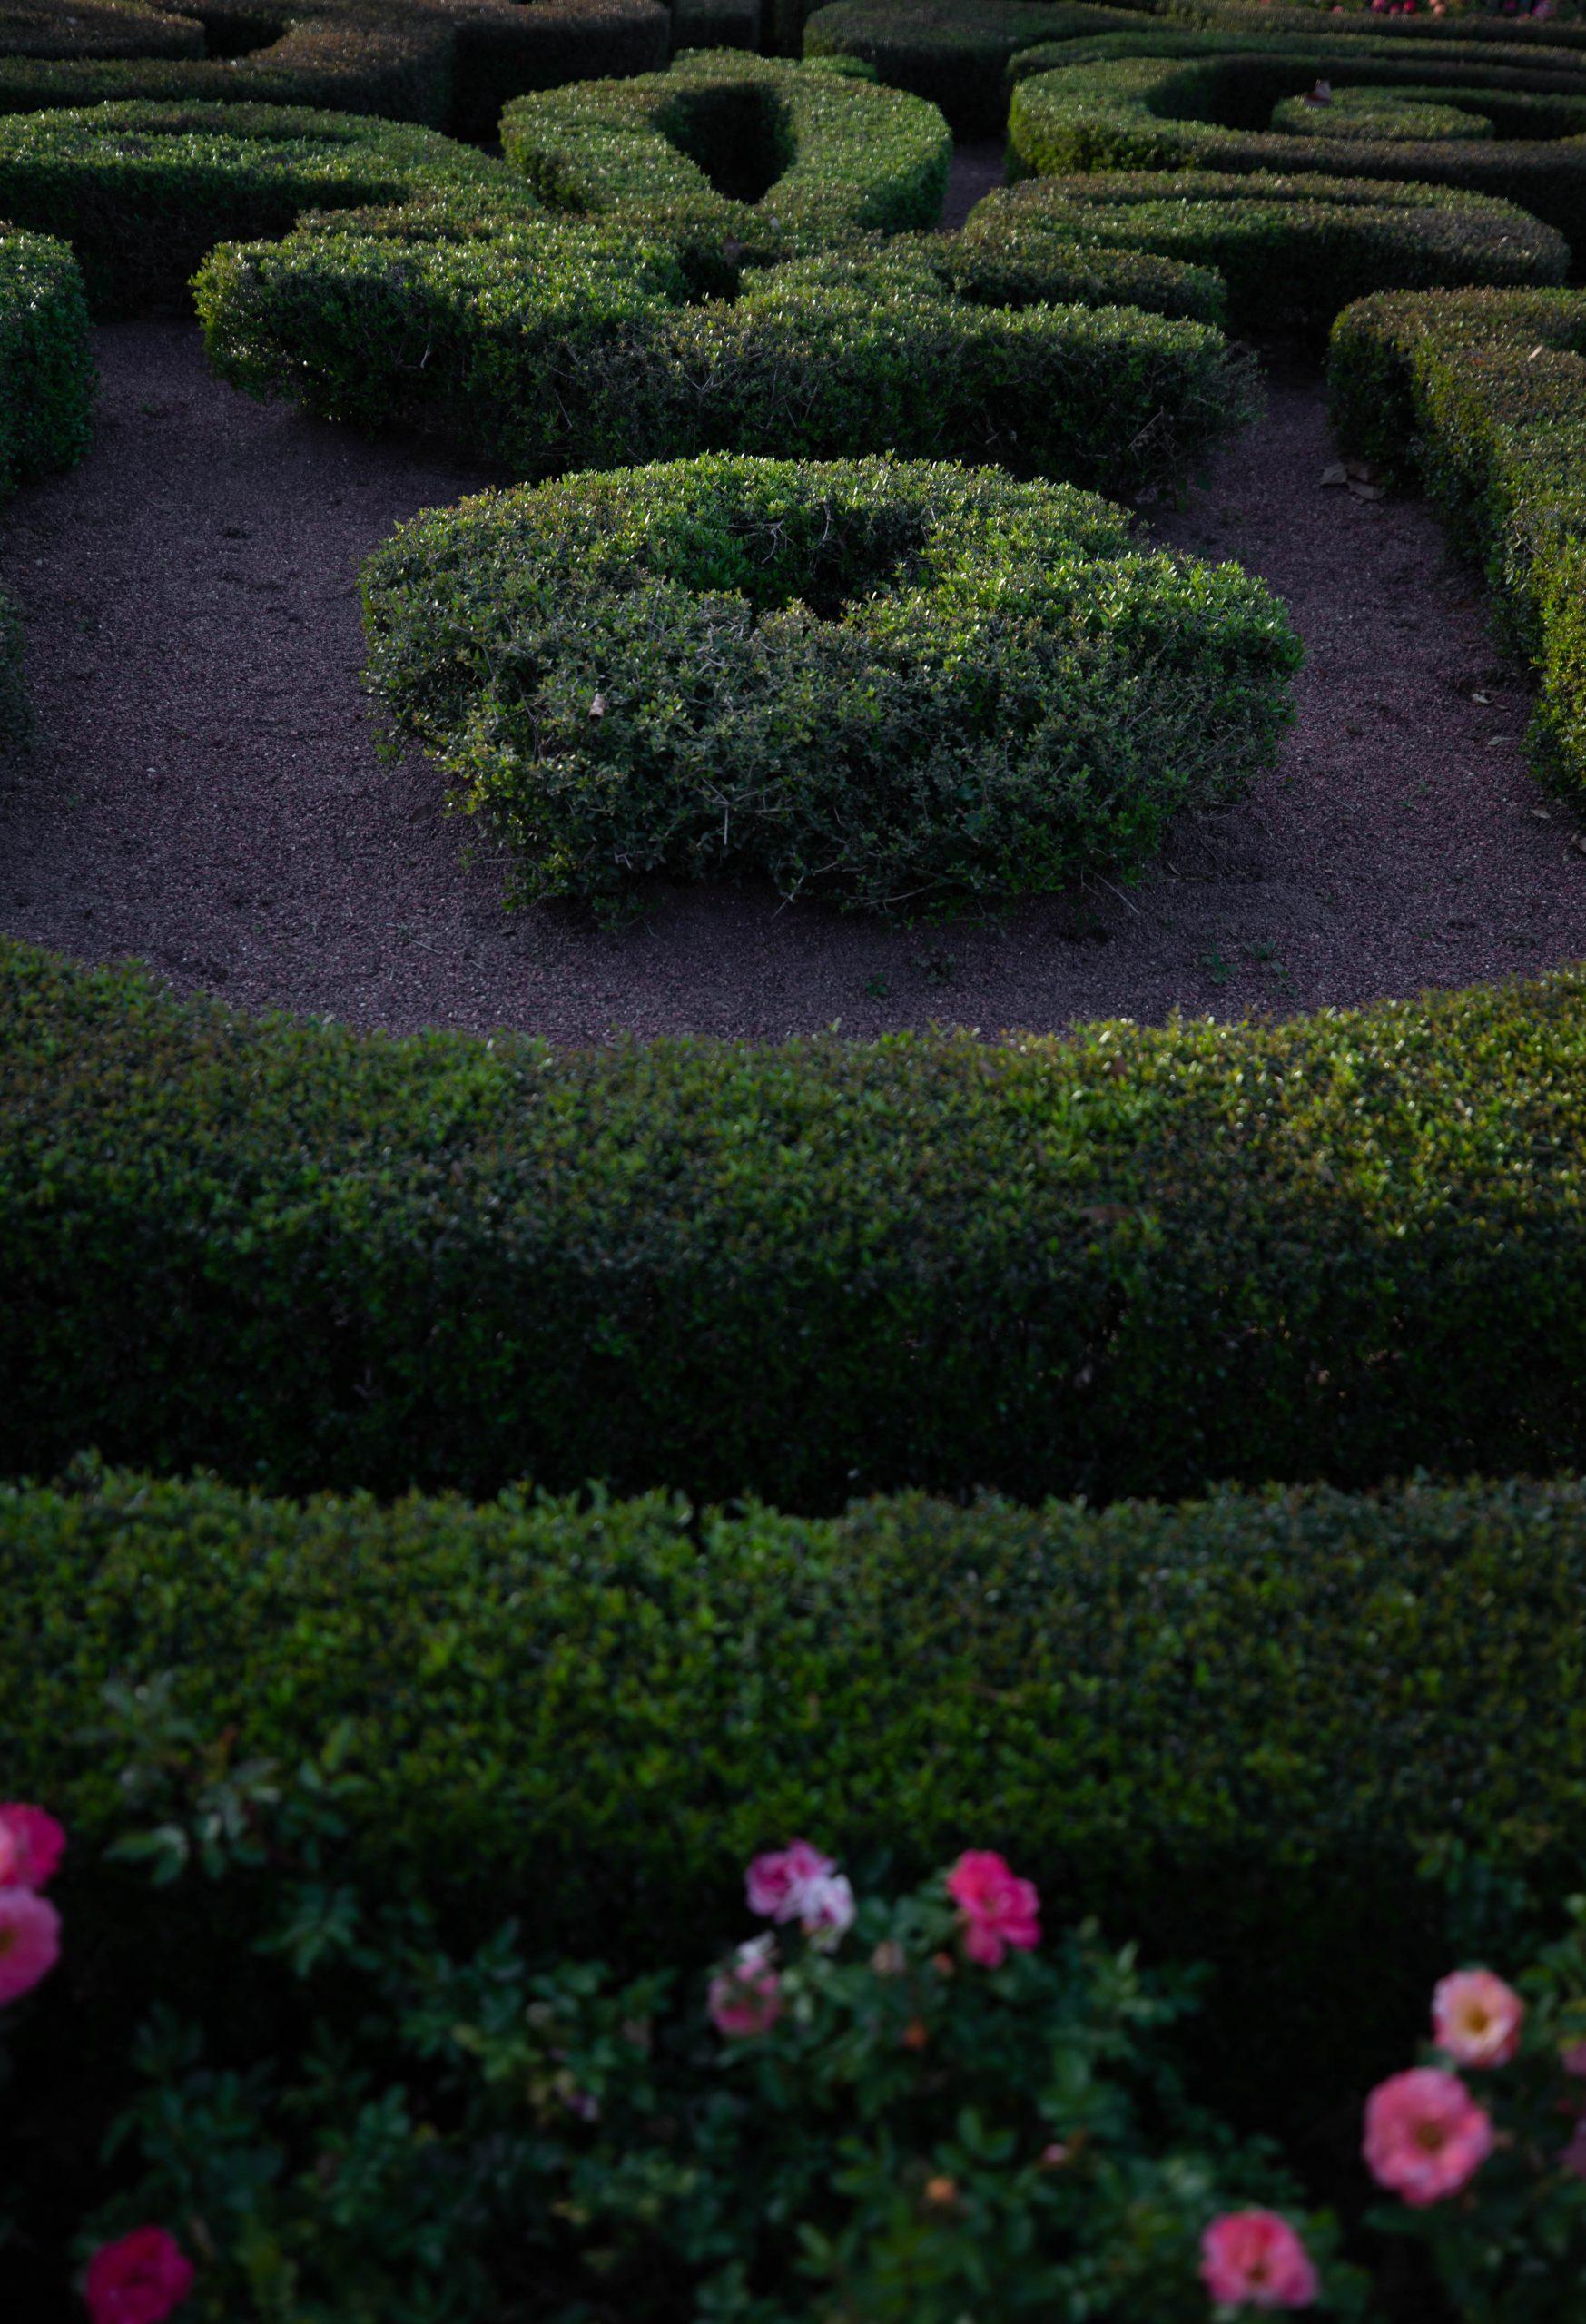 France Gardens at Epcot Walt Disney World Orlando Florida by Luxury Travel Writer and Photographer Annie Fairfax